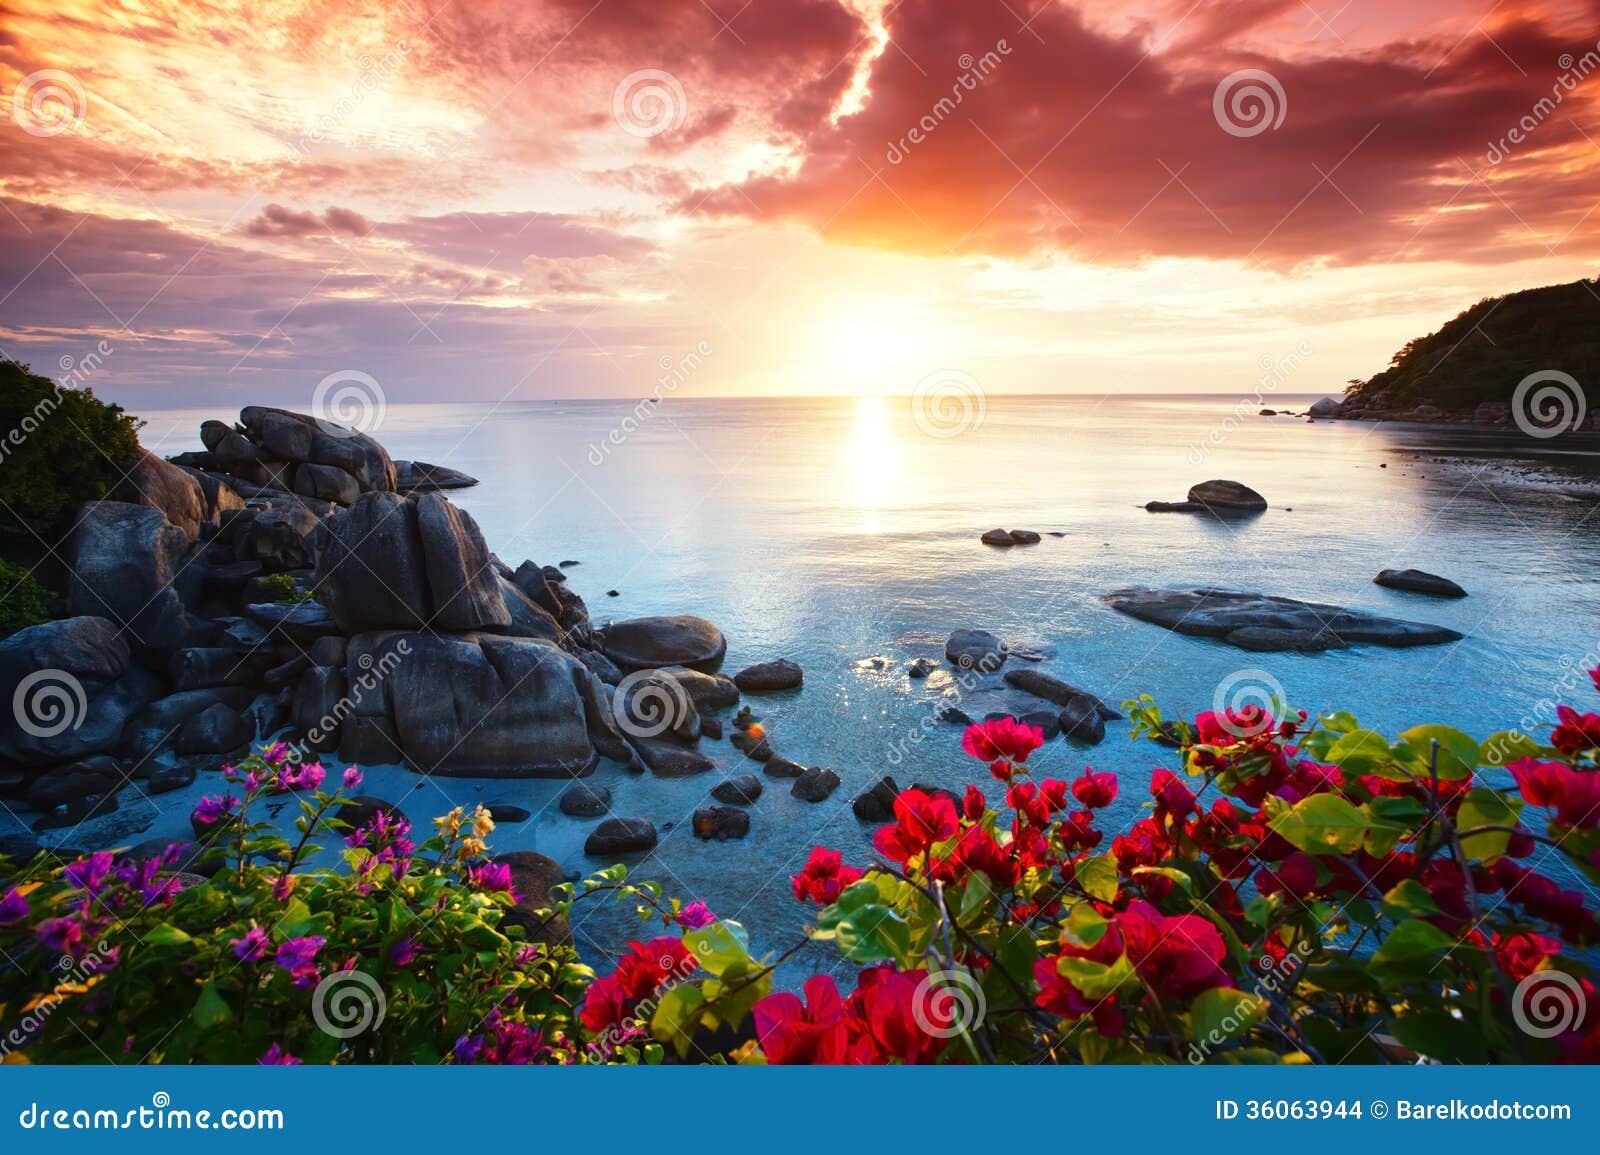 Seascape Beach Resort >> Tranquil Beach Resort, Beautiful Morning Glory Stock Images - Image: 36063944